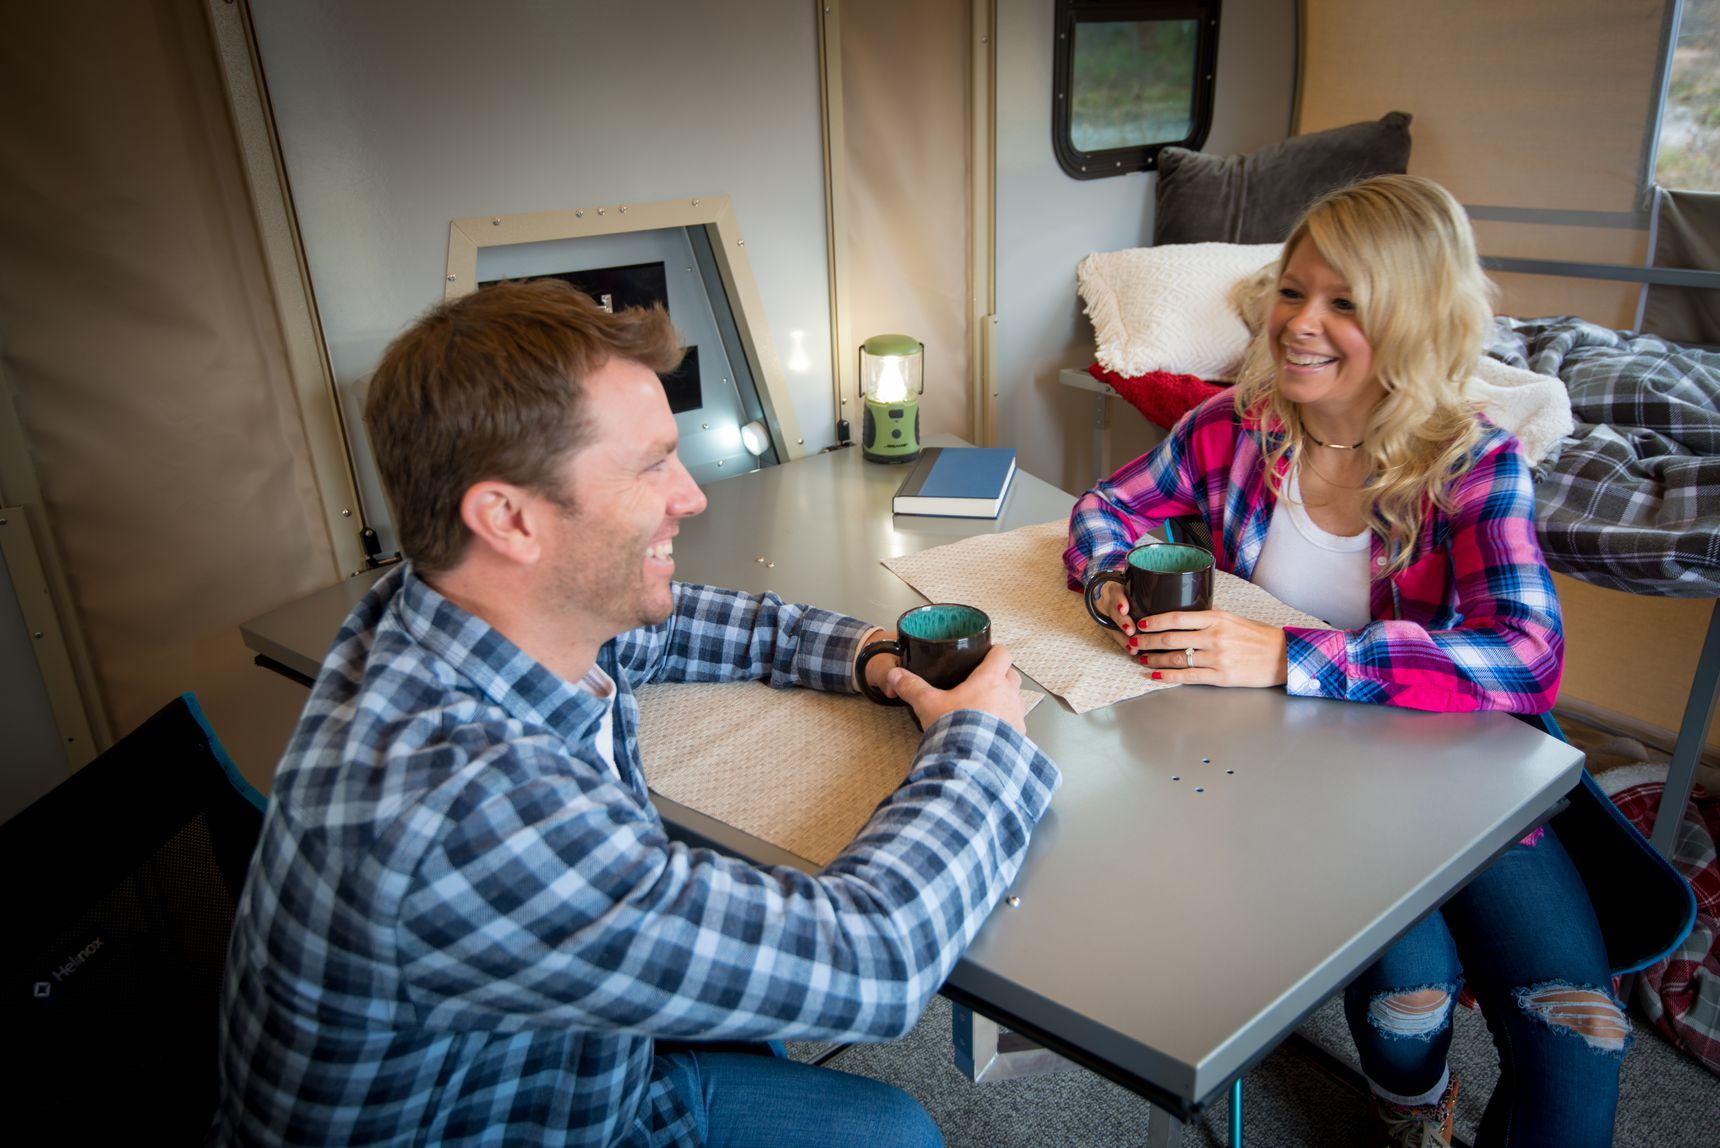 travel trailer - sitting